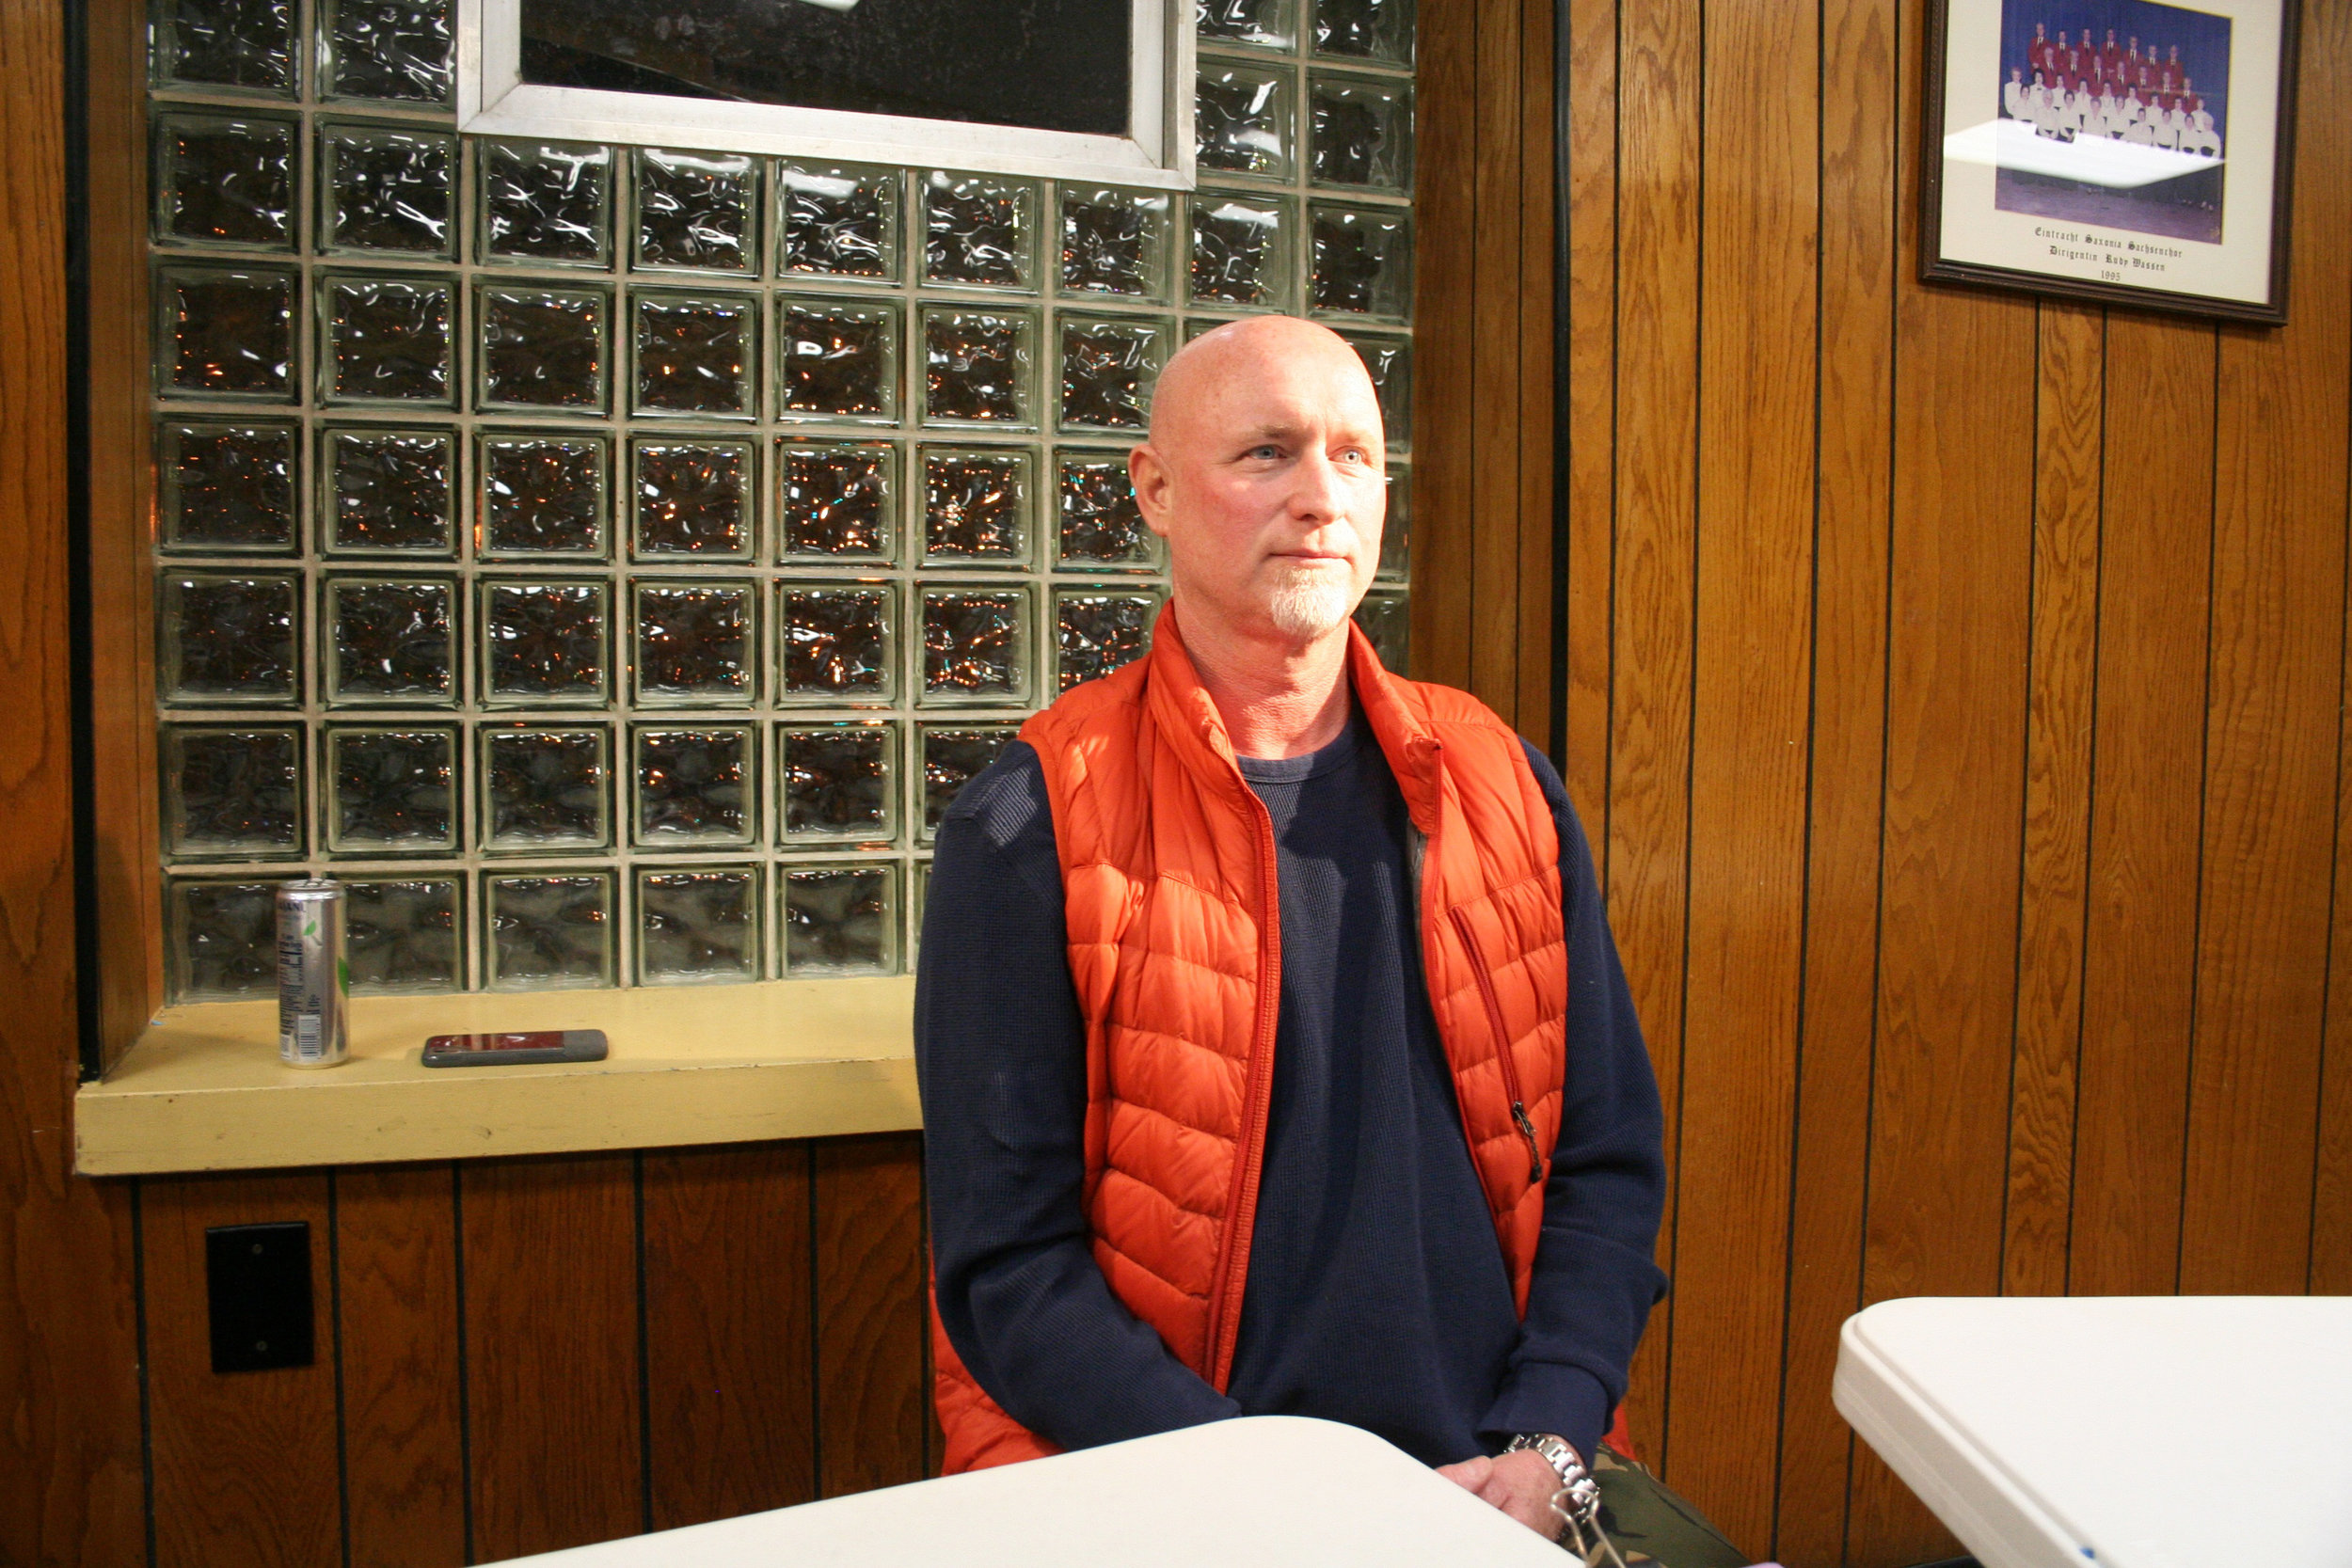 Michael Weigand at Sachsenheim Hall 3-1-19.jpg